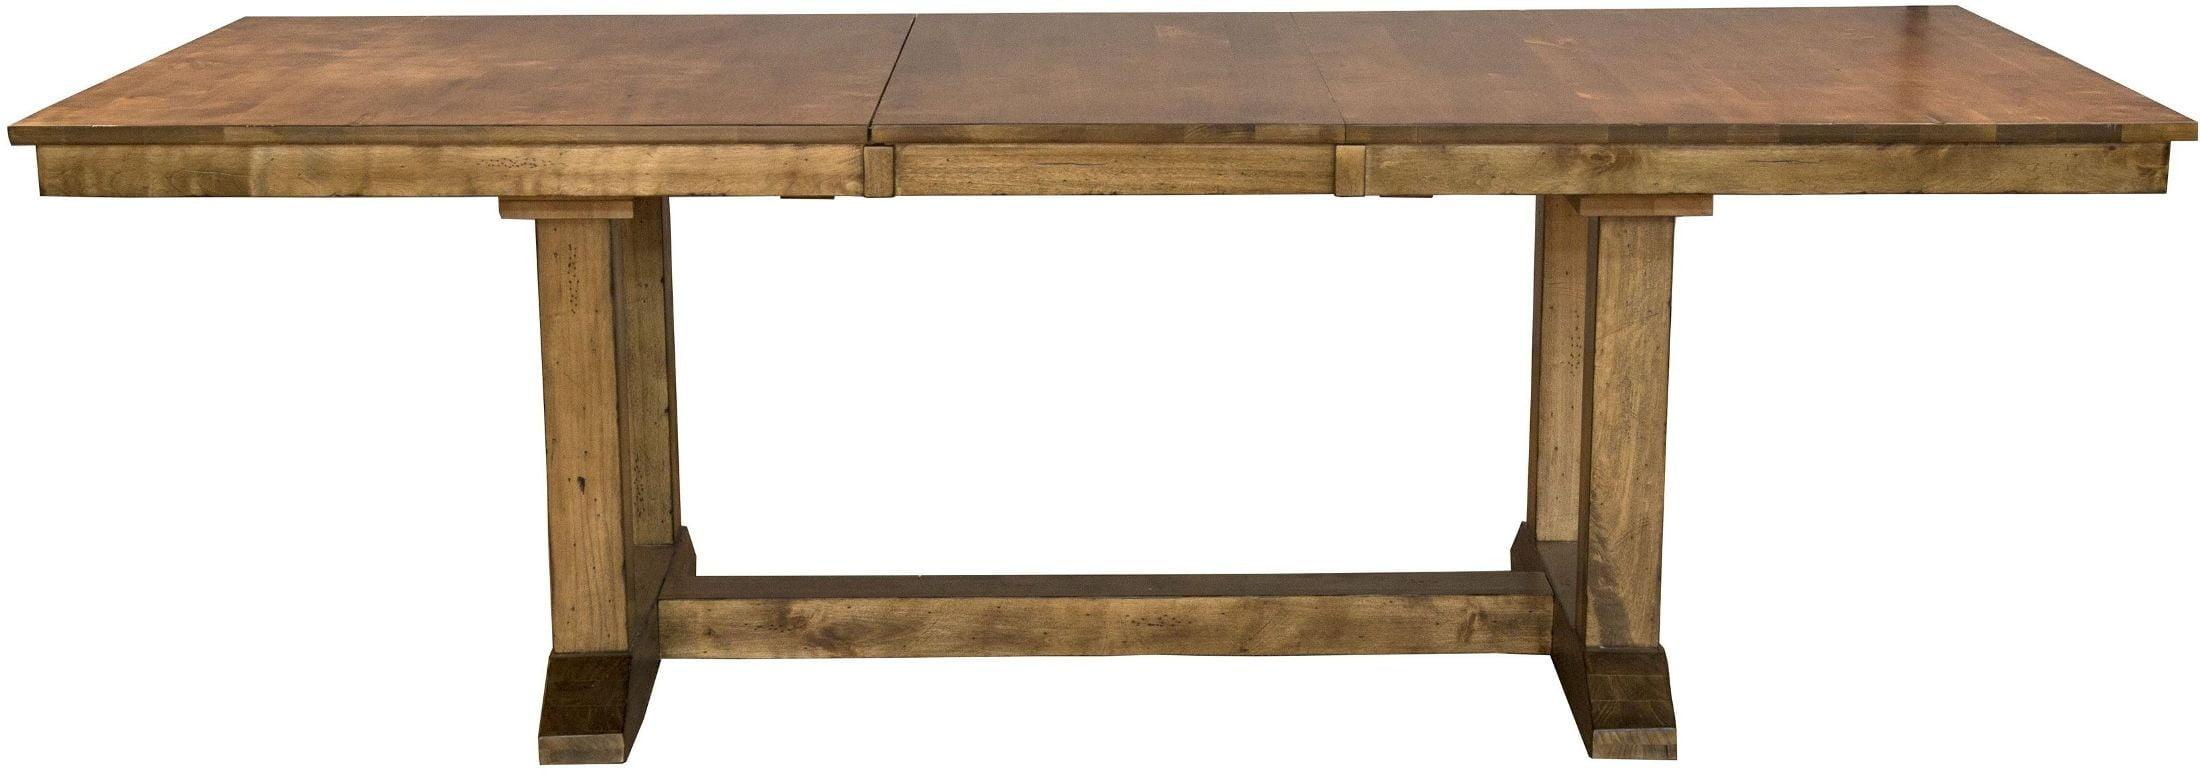 bennett smoky quartz extendable rectangular trestle dining table from a america coleman furniture. Black Bedroom Furniture Sets. Home Design Ideas